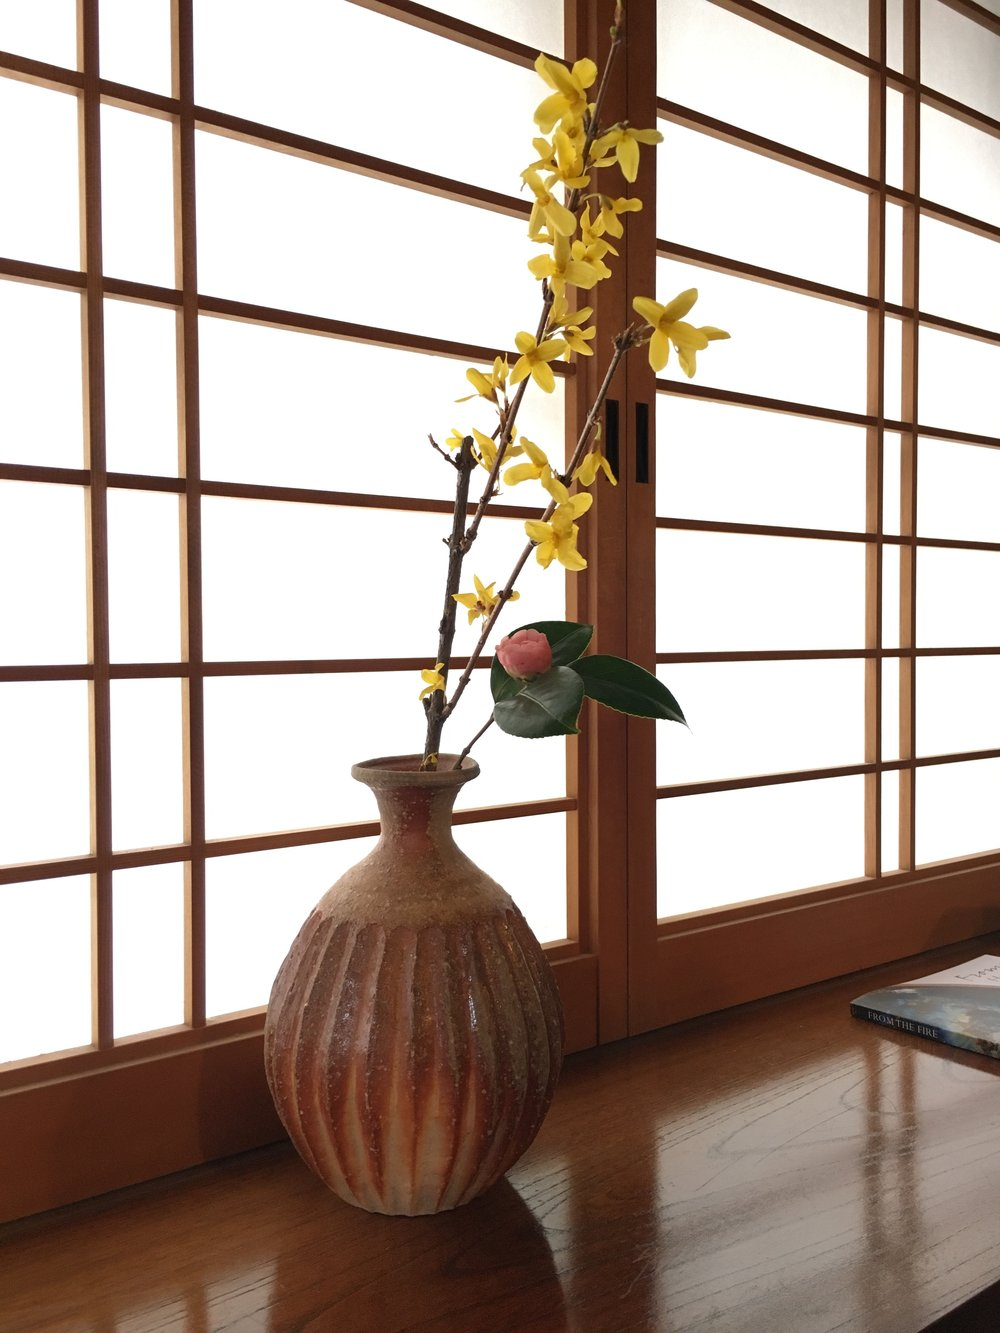 Yoshiko's beautiful vase and flower arrangement.